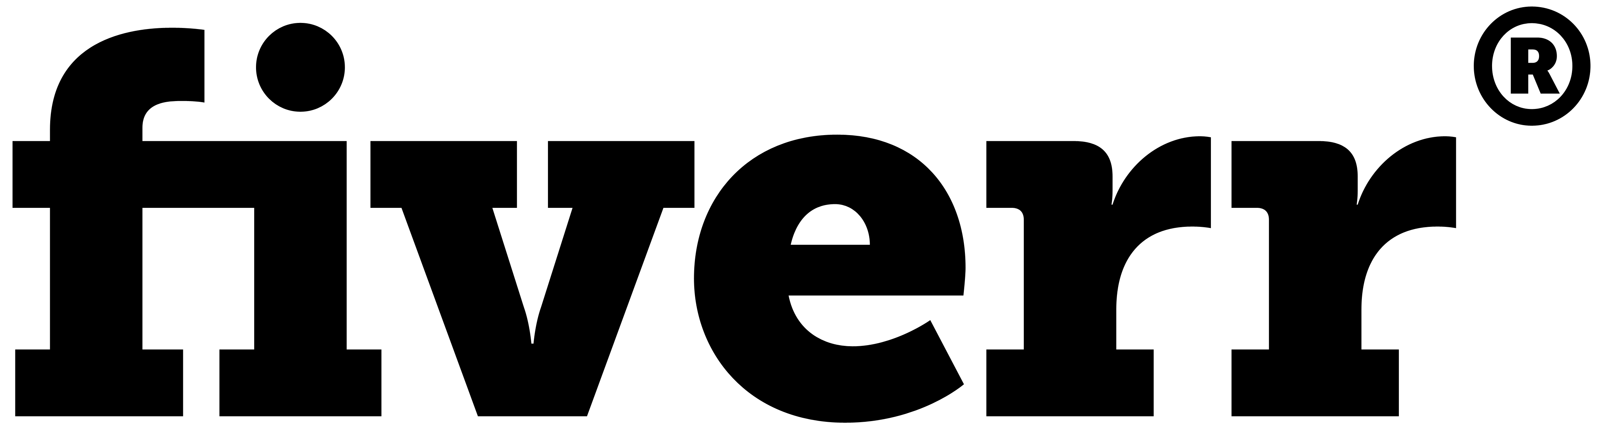 fiver logo png